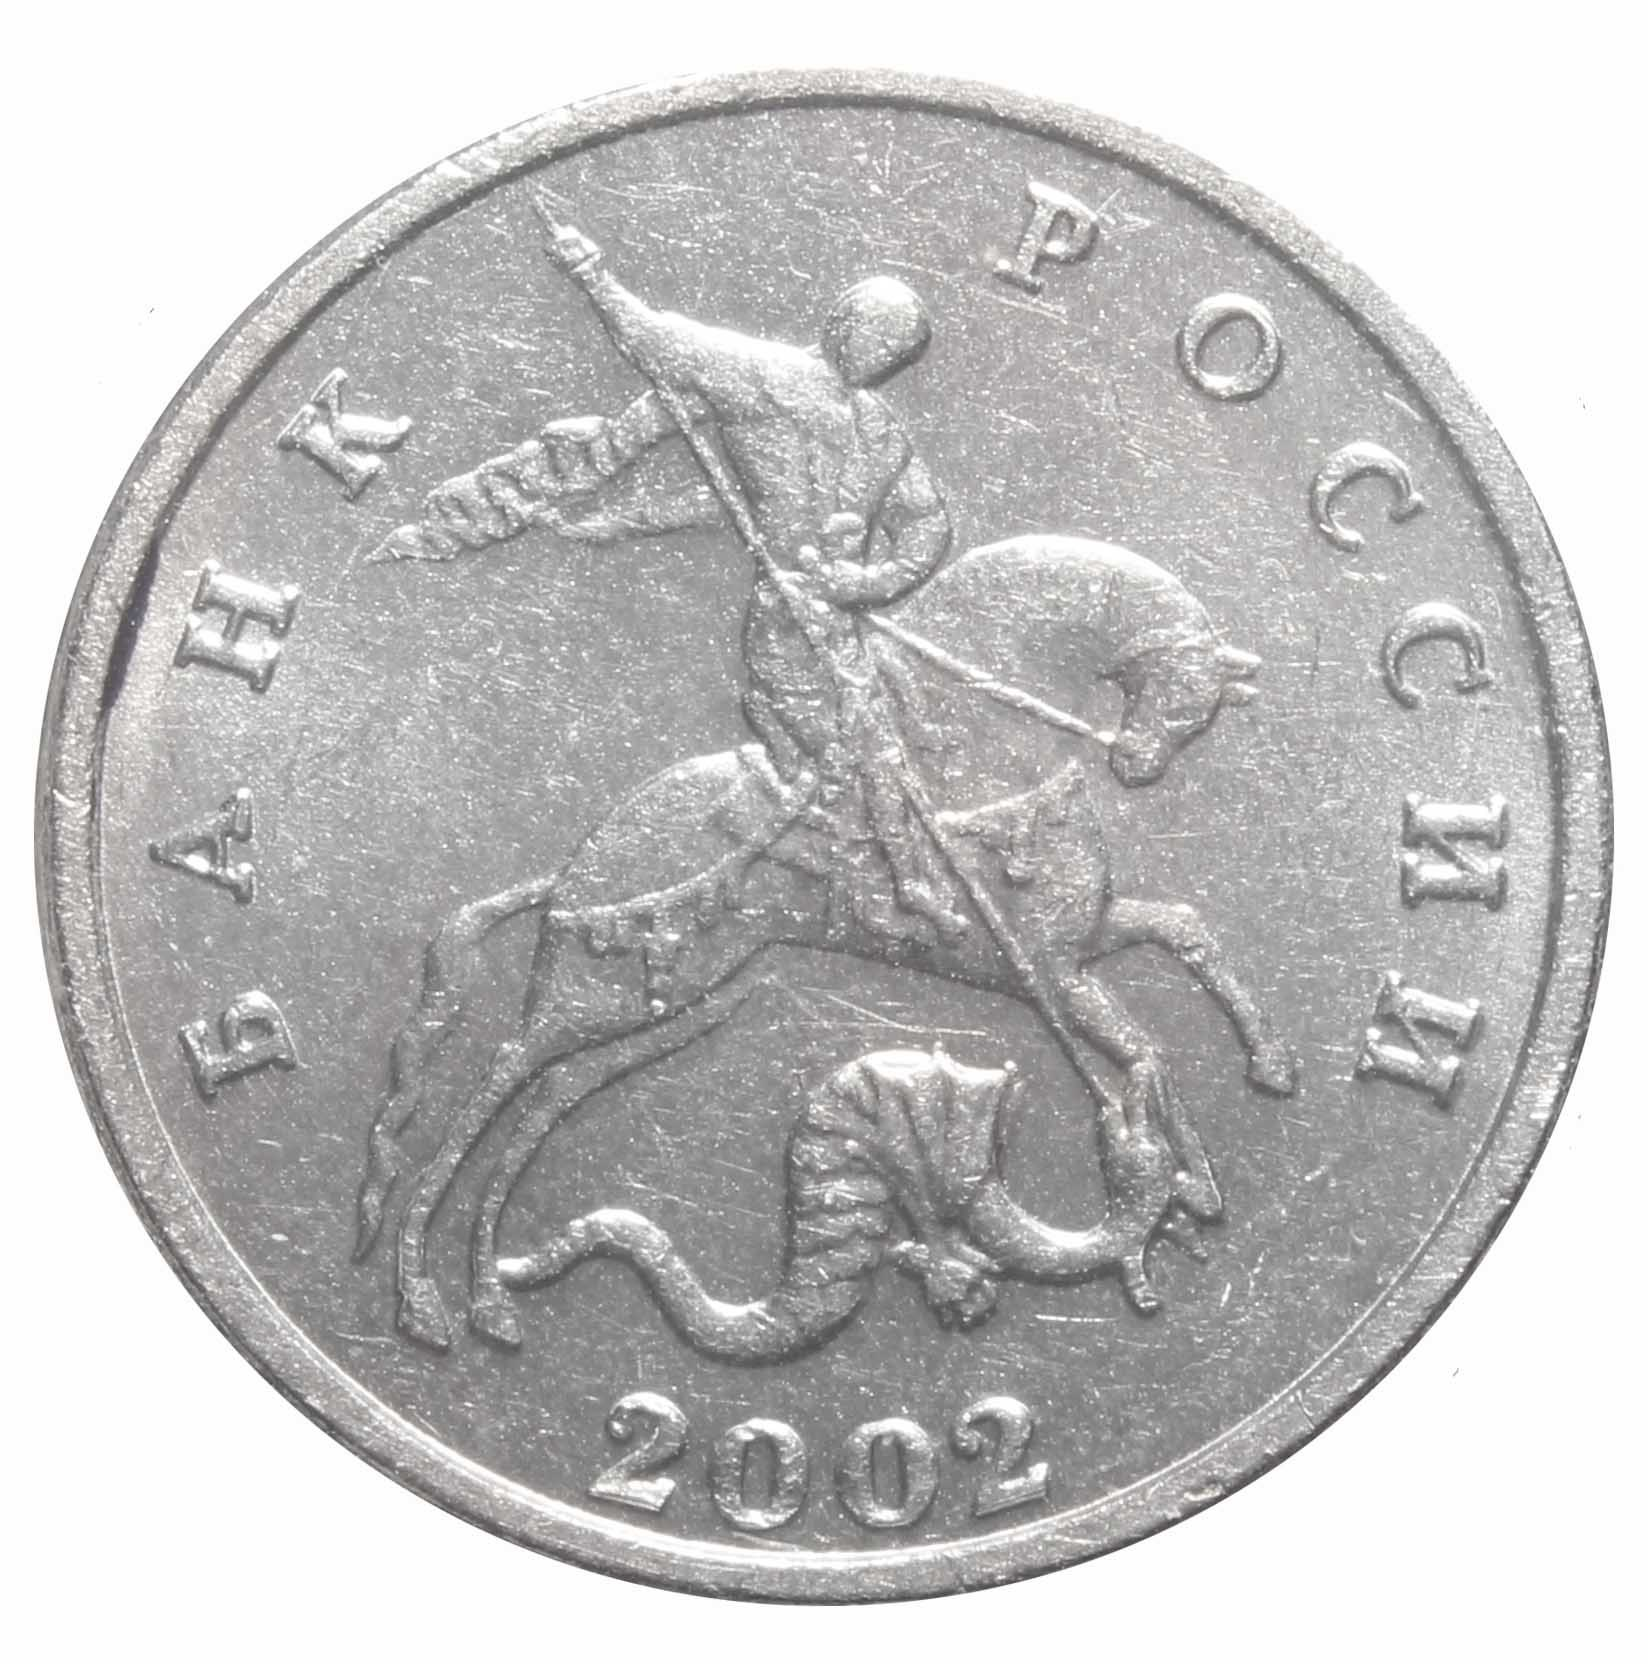 5 копеек 2002 года (Без знака монетного двора) XF-AU